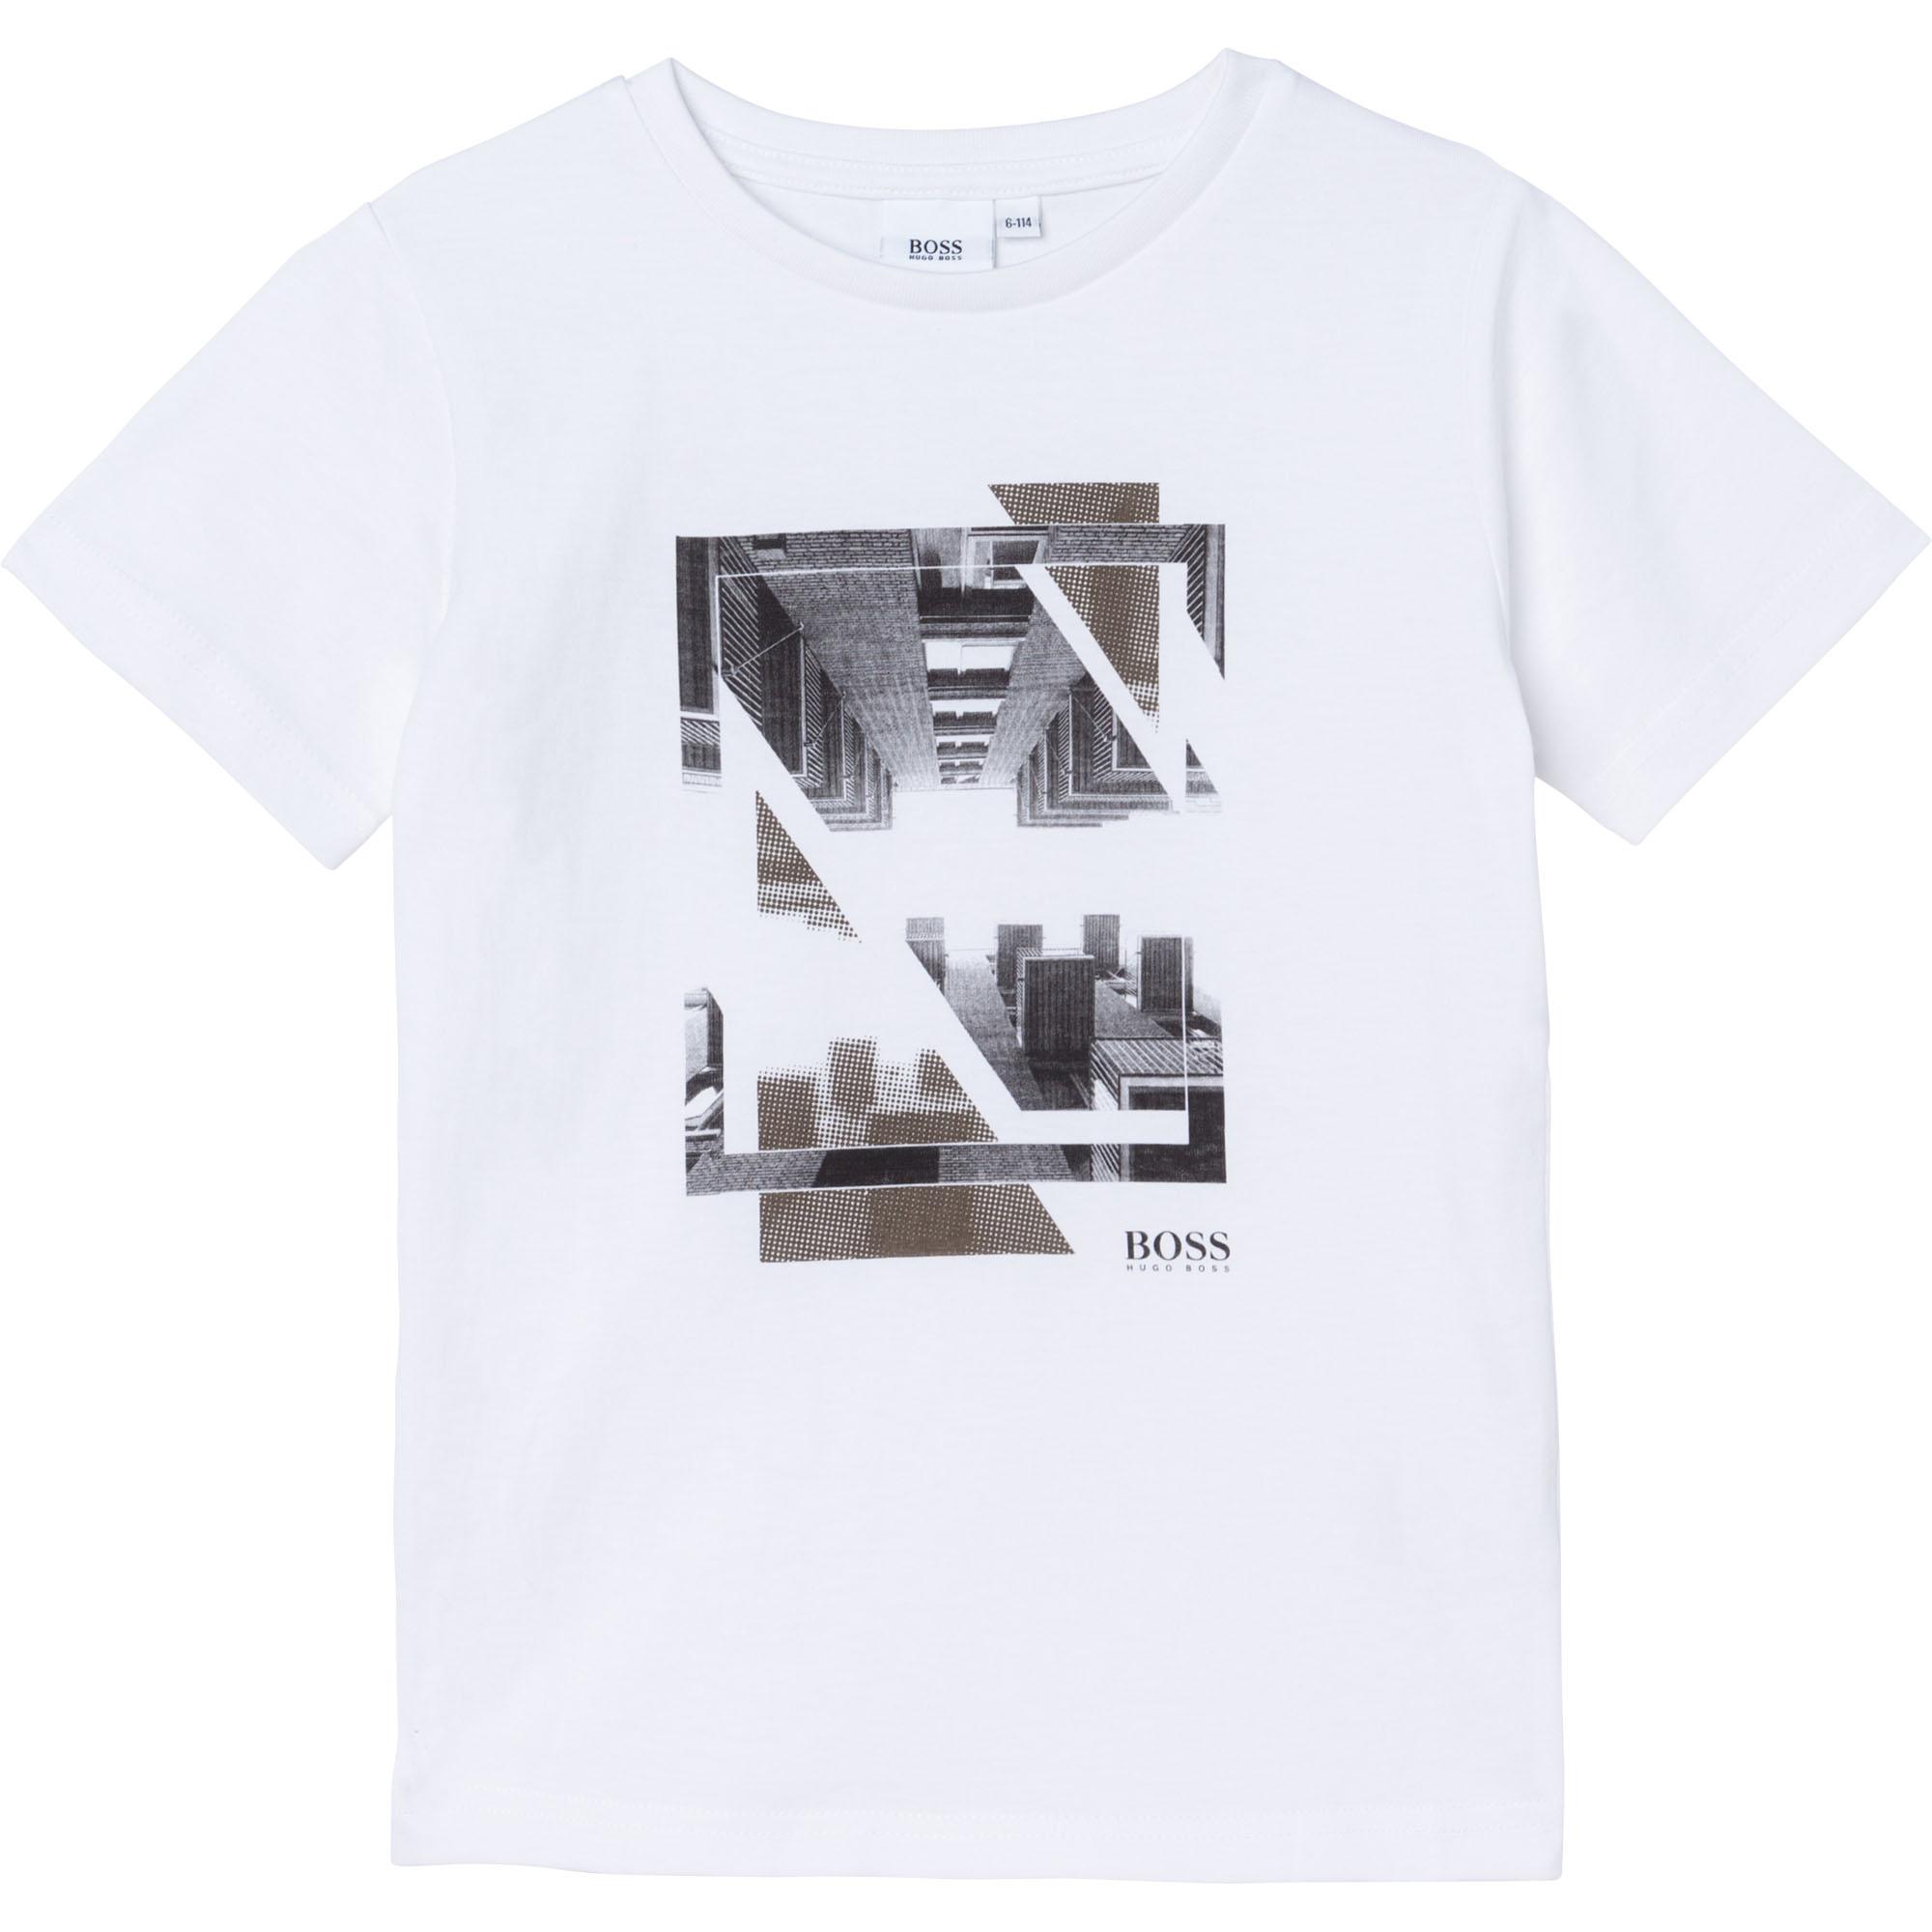 Short-sleeved T-shirt BOSS for BOY